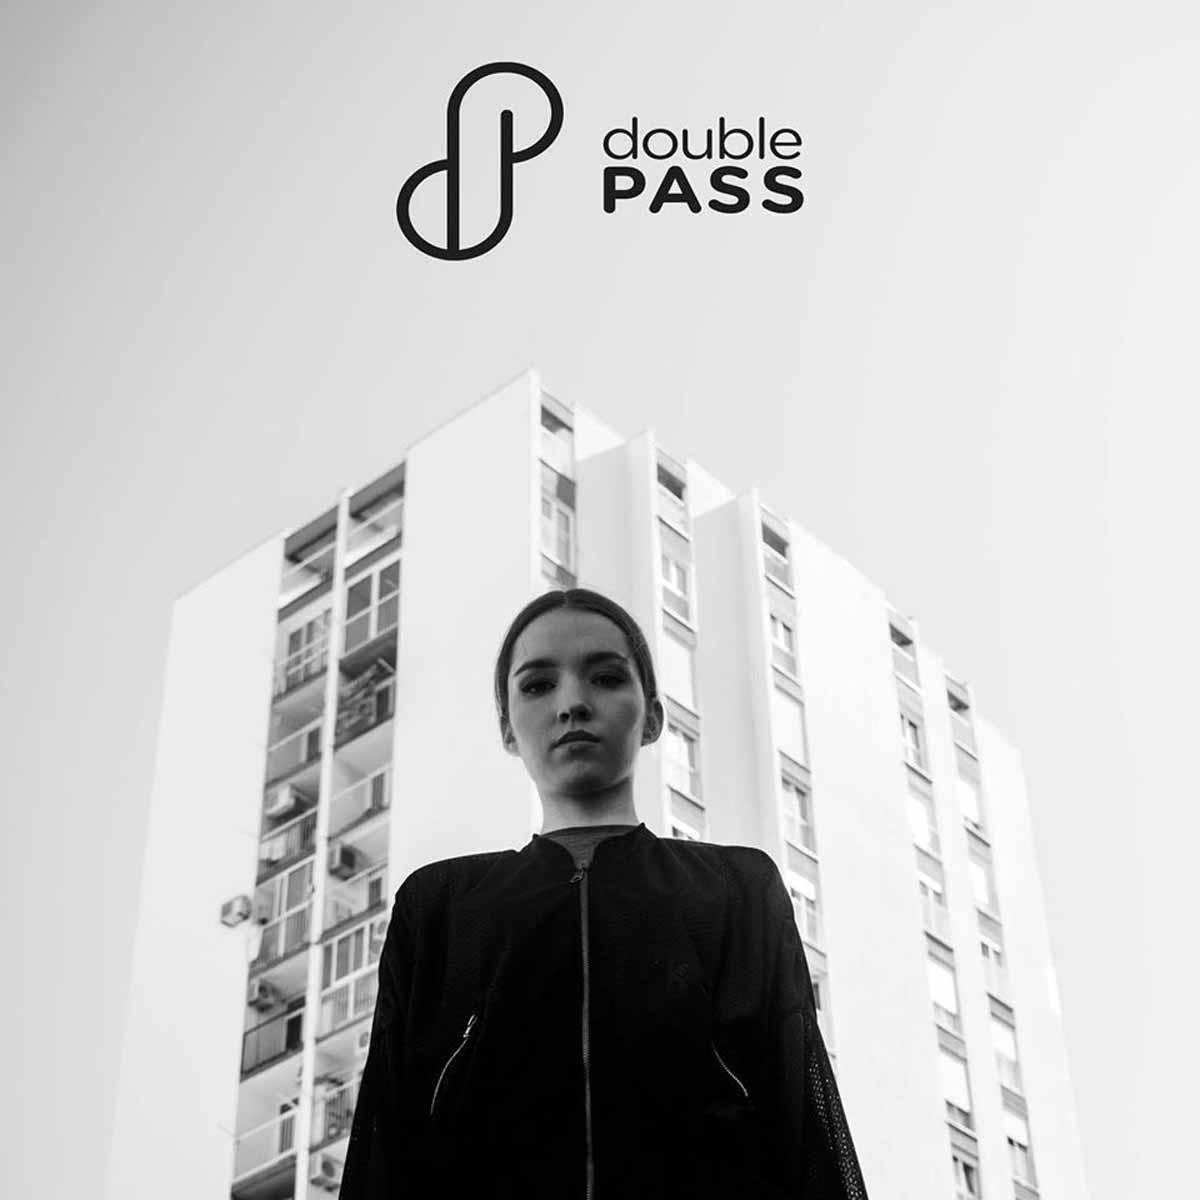 Double PASS - nova modna kampanja naše alumne SUZANE VULJAN